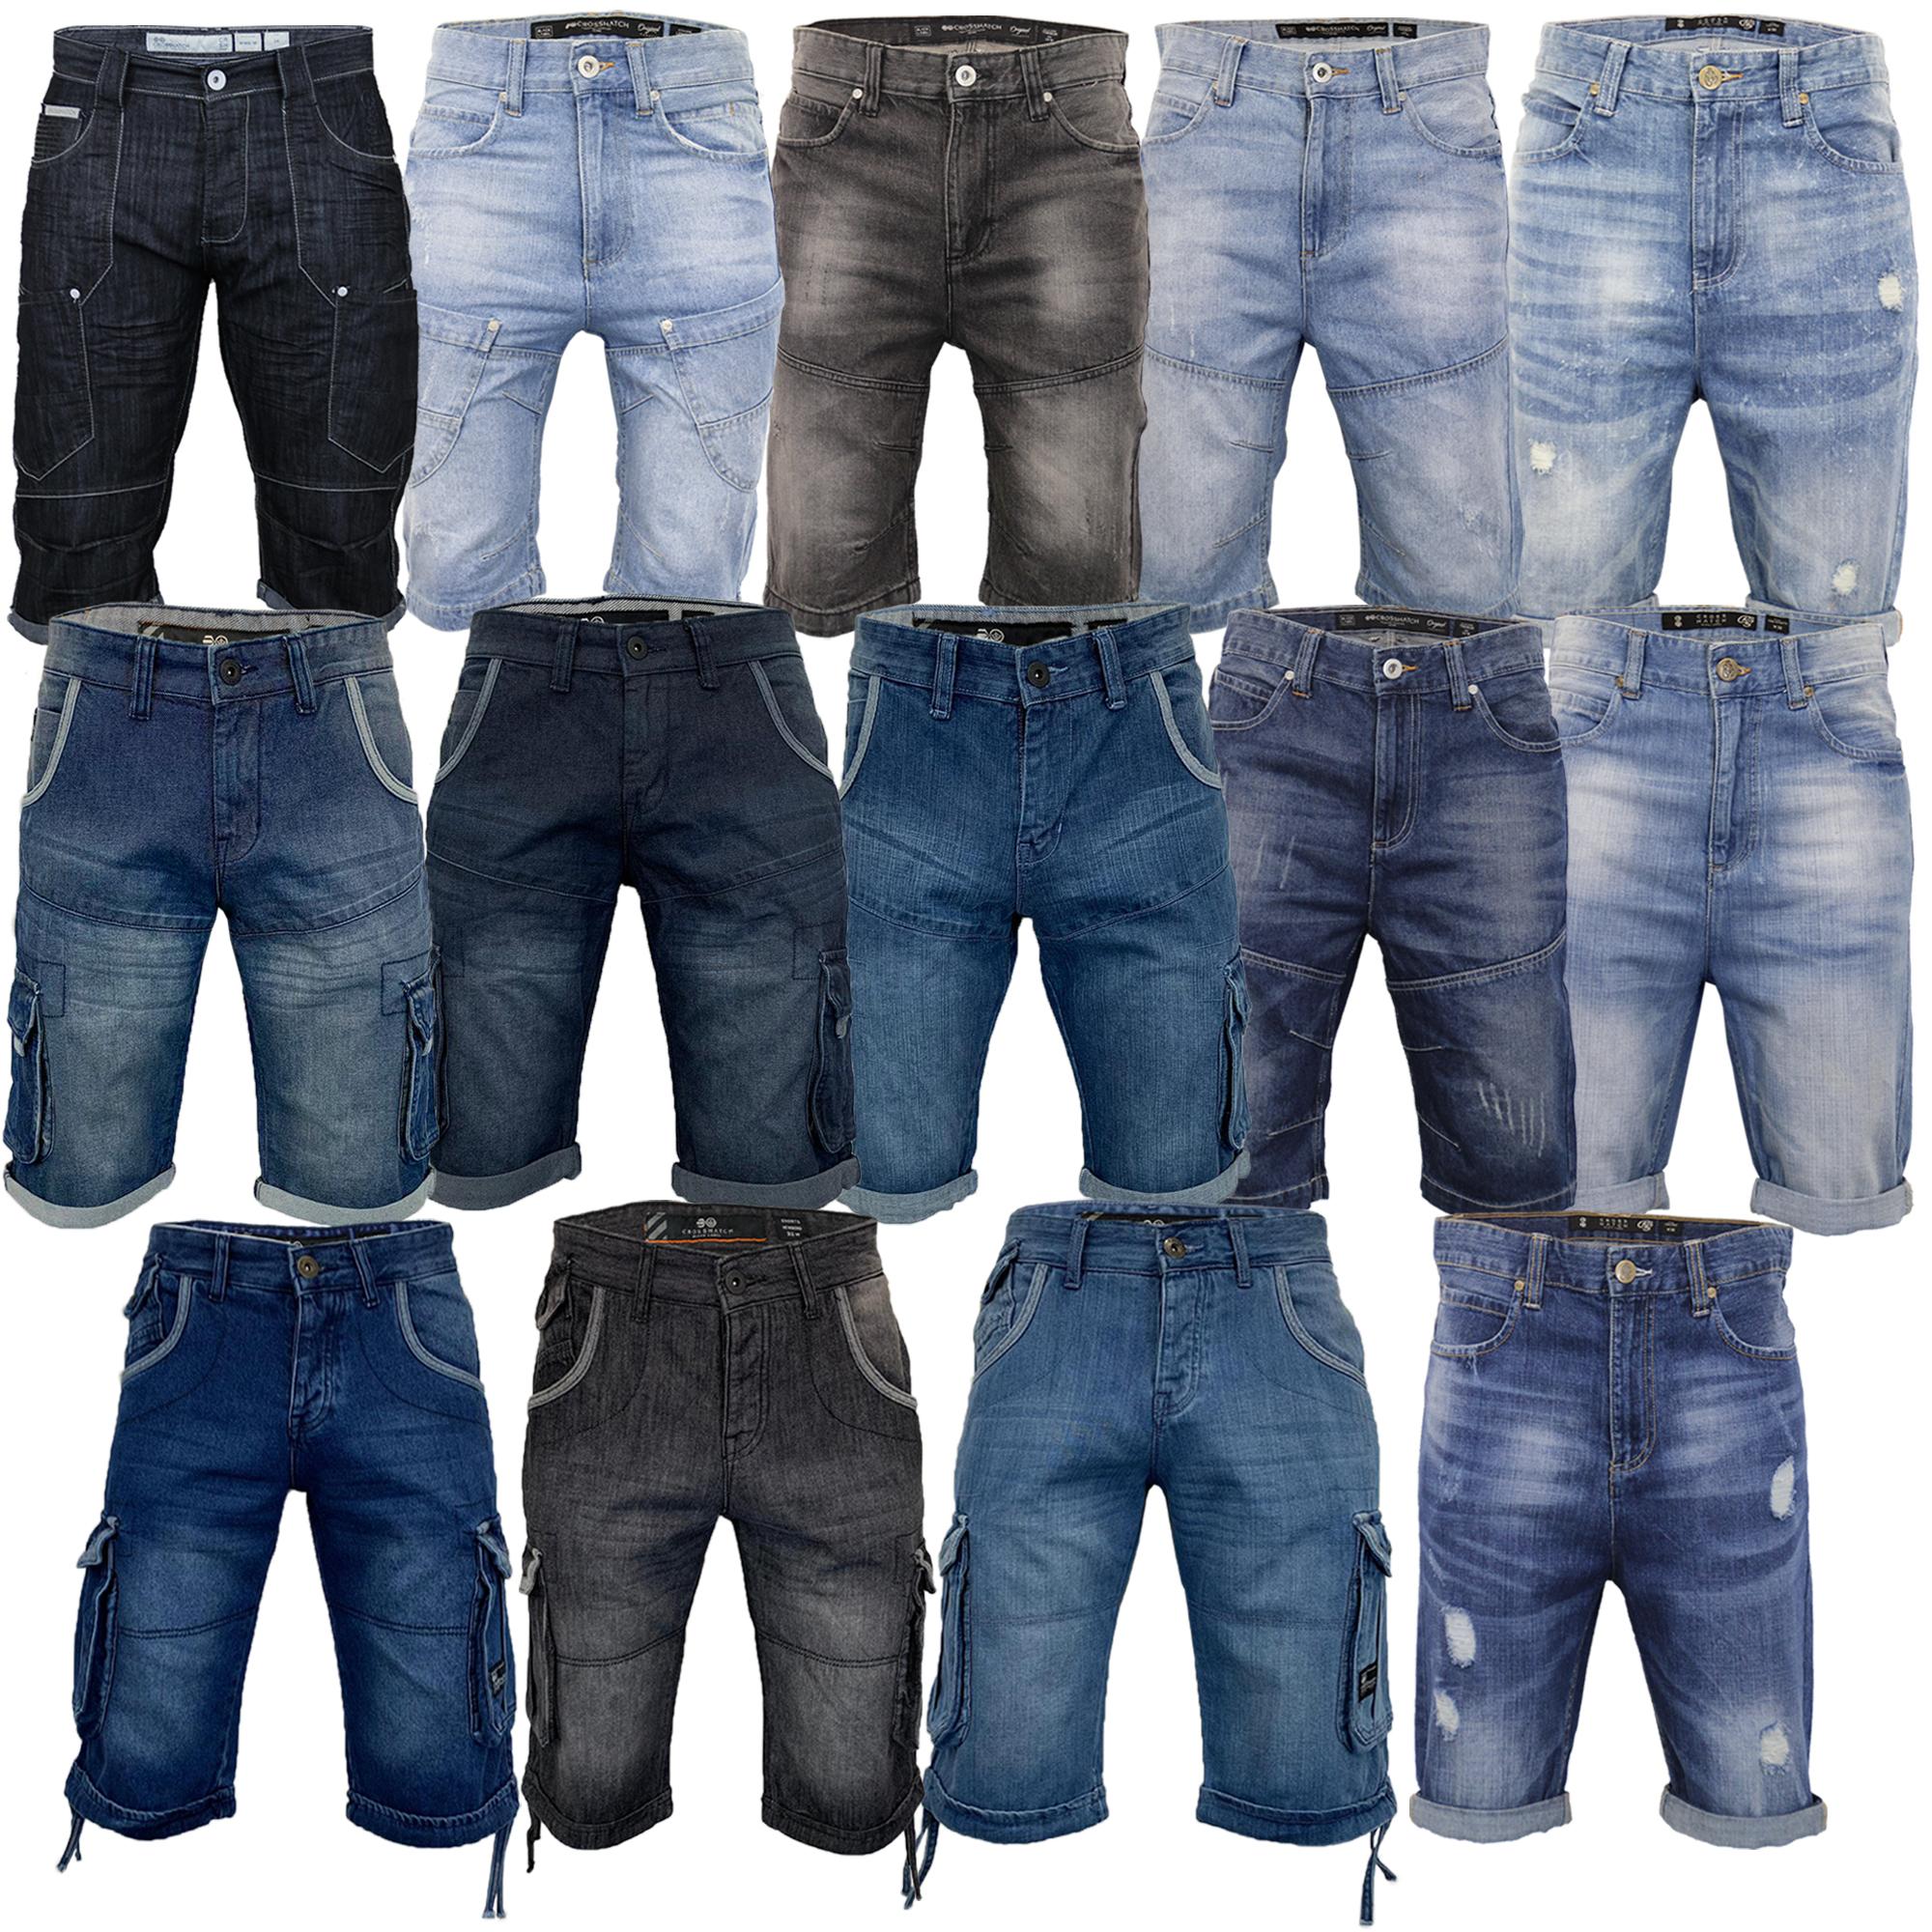 Mens-Crosshatch-Denim-Knee-Length-Combat-Shorts-Cargo-Casual-Fashion-Summer-New 縮圖 4